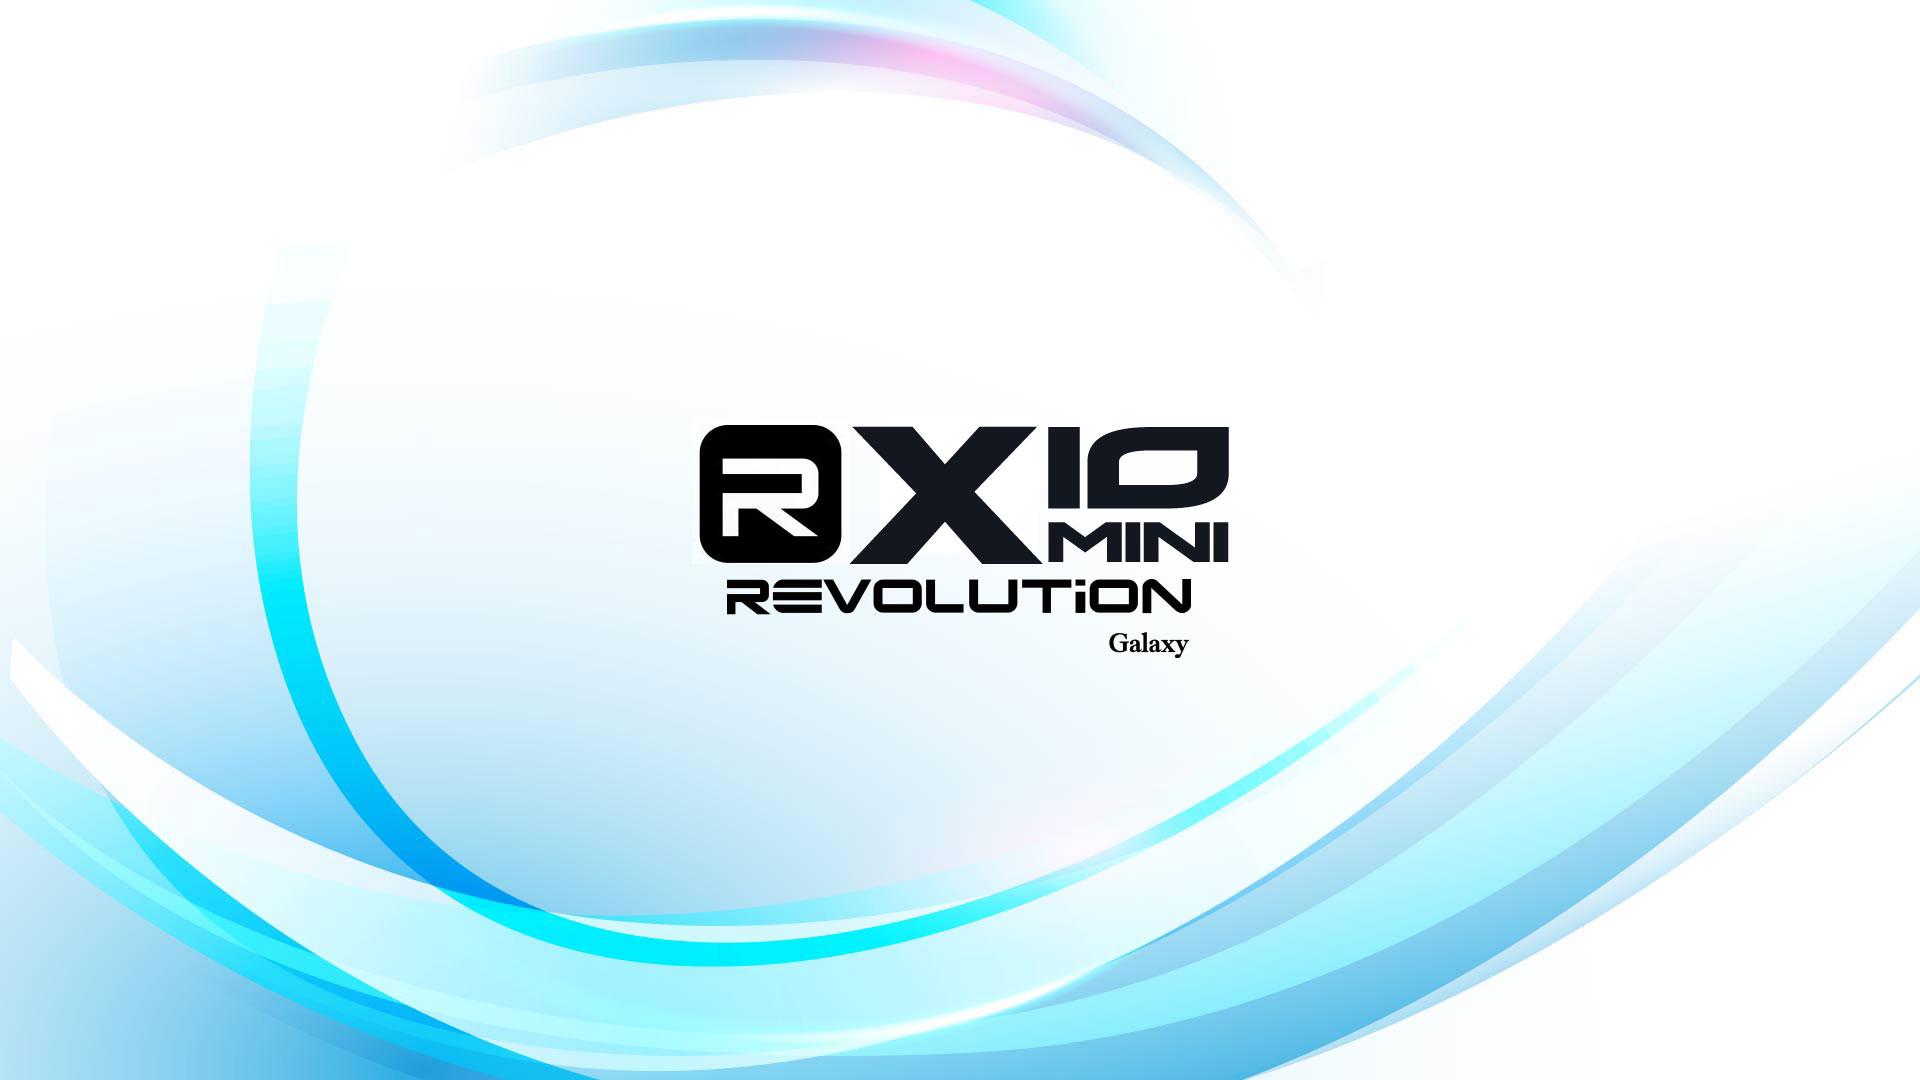 Download Firmware Revolution Galaxy X10 Mini New Software Receiver